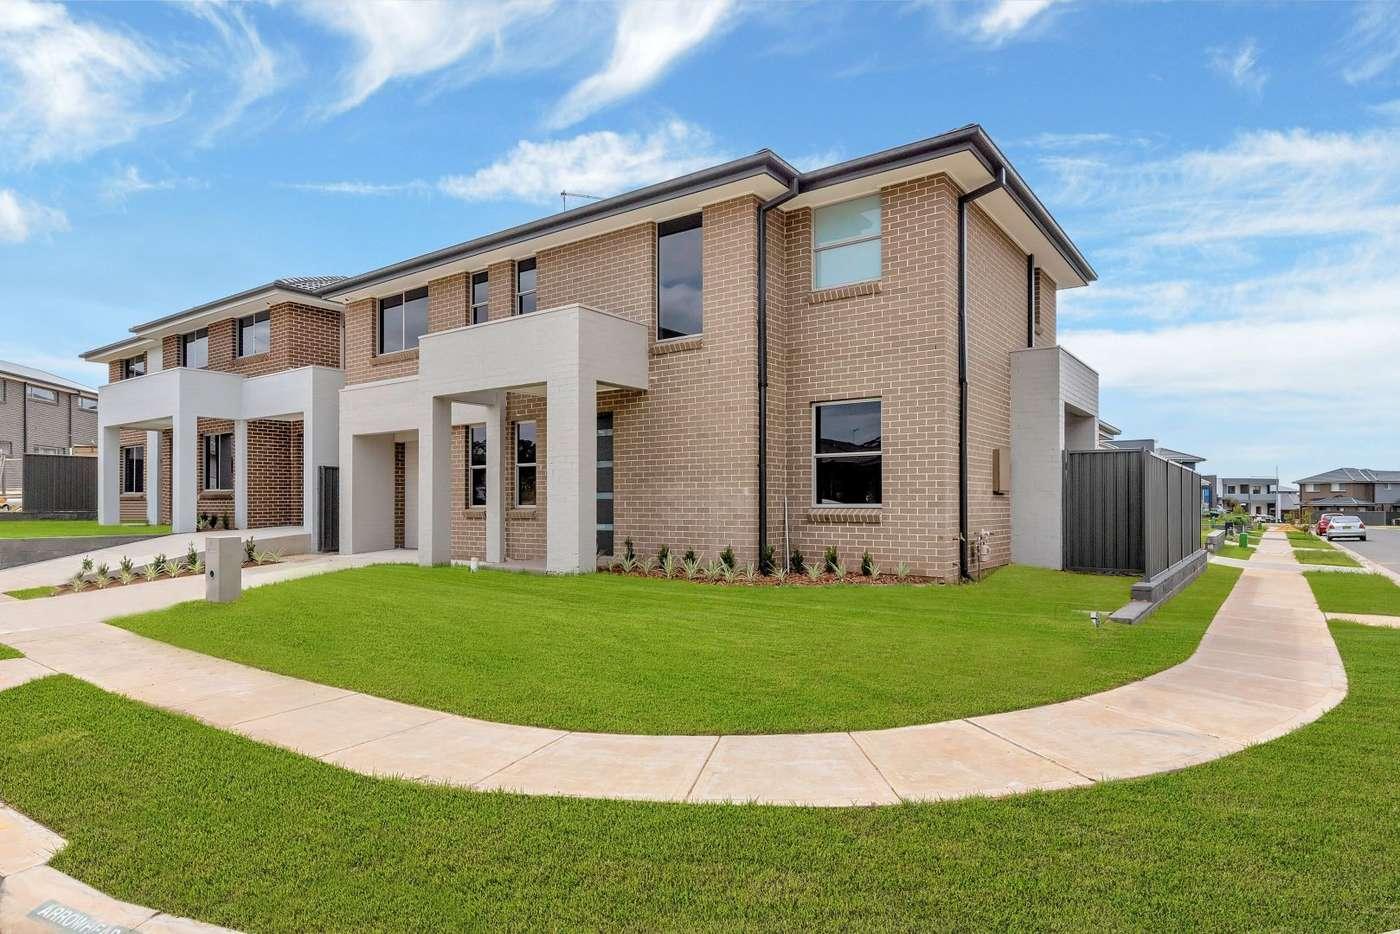 Main view of Homely house listing, 2a Arrowhead, Leppington NSW 2179